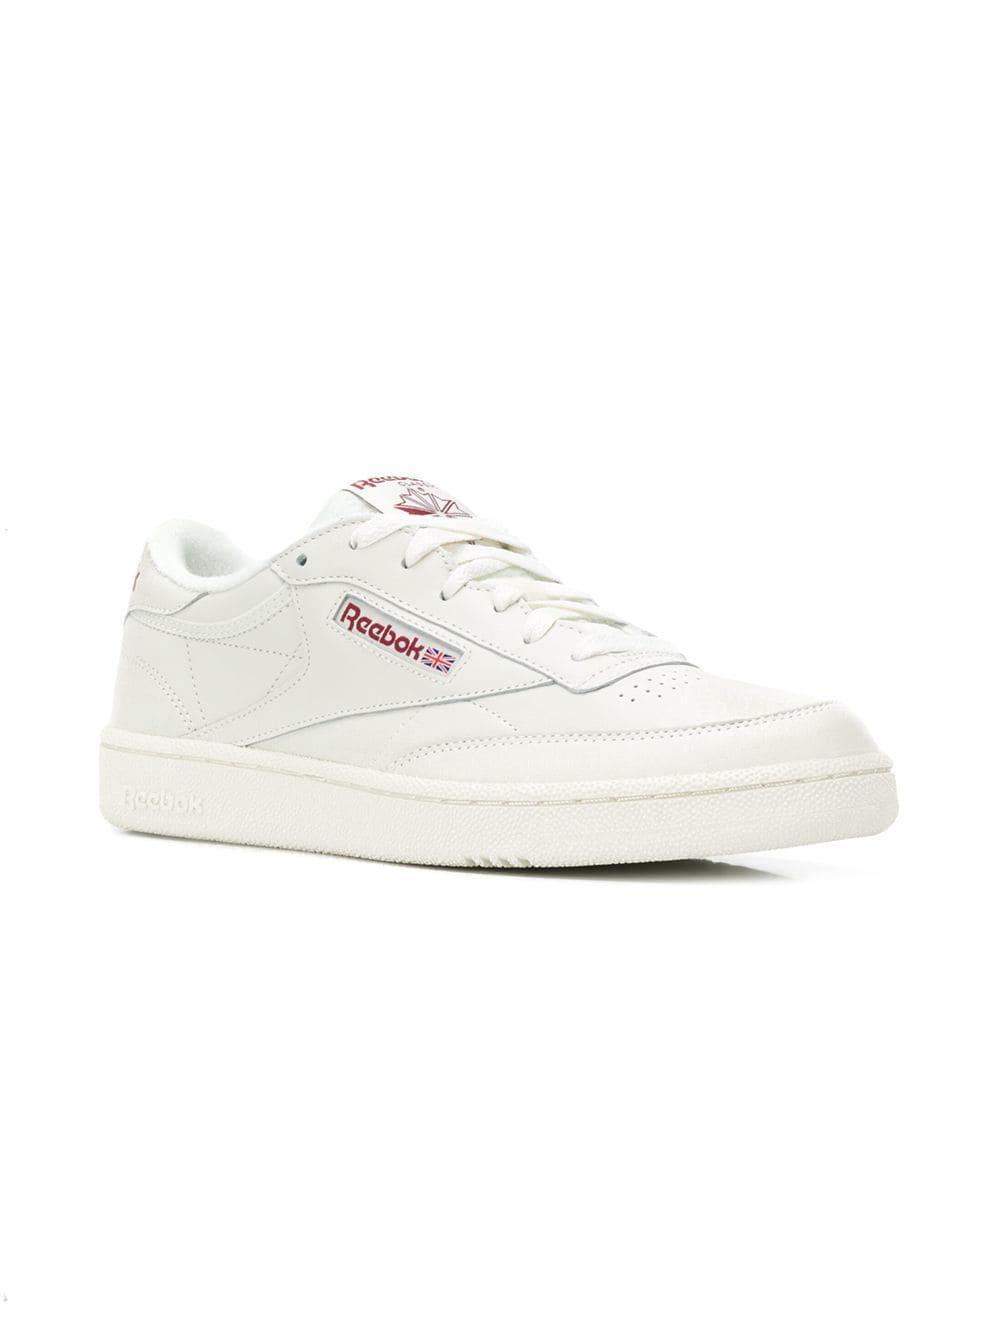 61d323672523 Reebok - White Classic Low Sneakers for Men - Lyst. View fullscreen